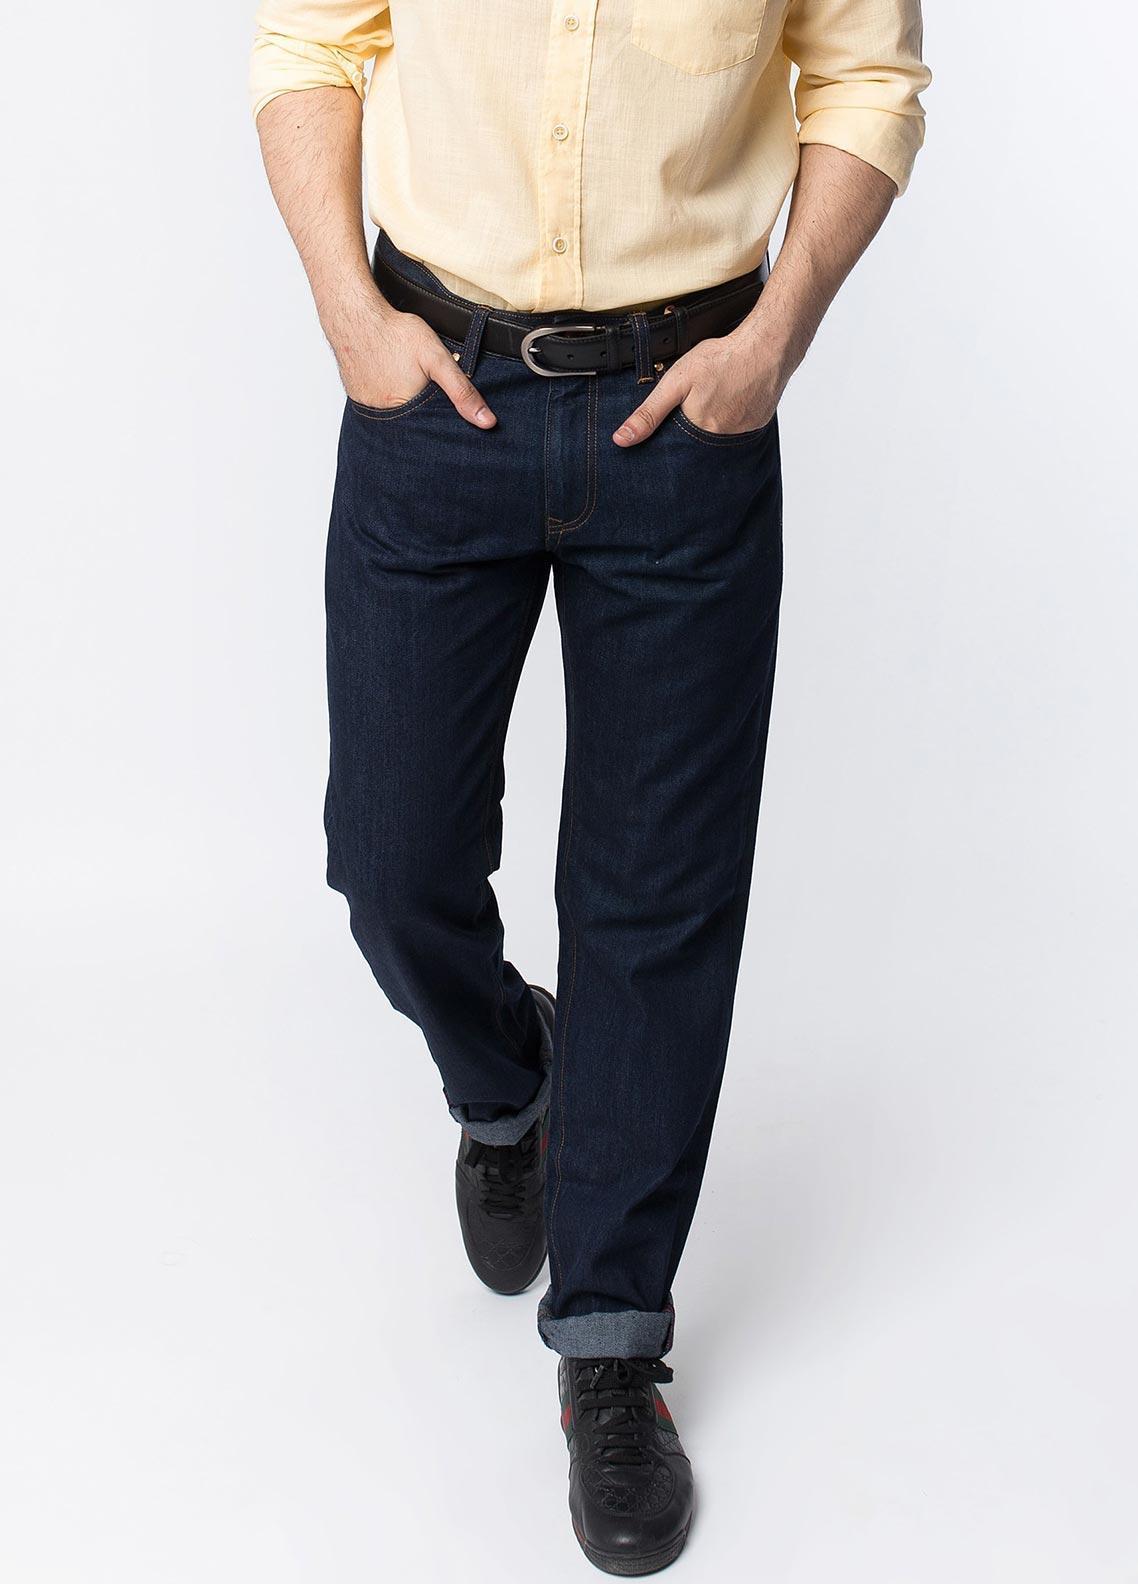 Brumano Denim Casual Jeans for Men - Blue 0-50-0018-006